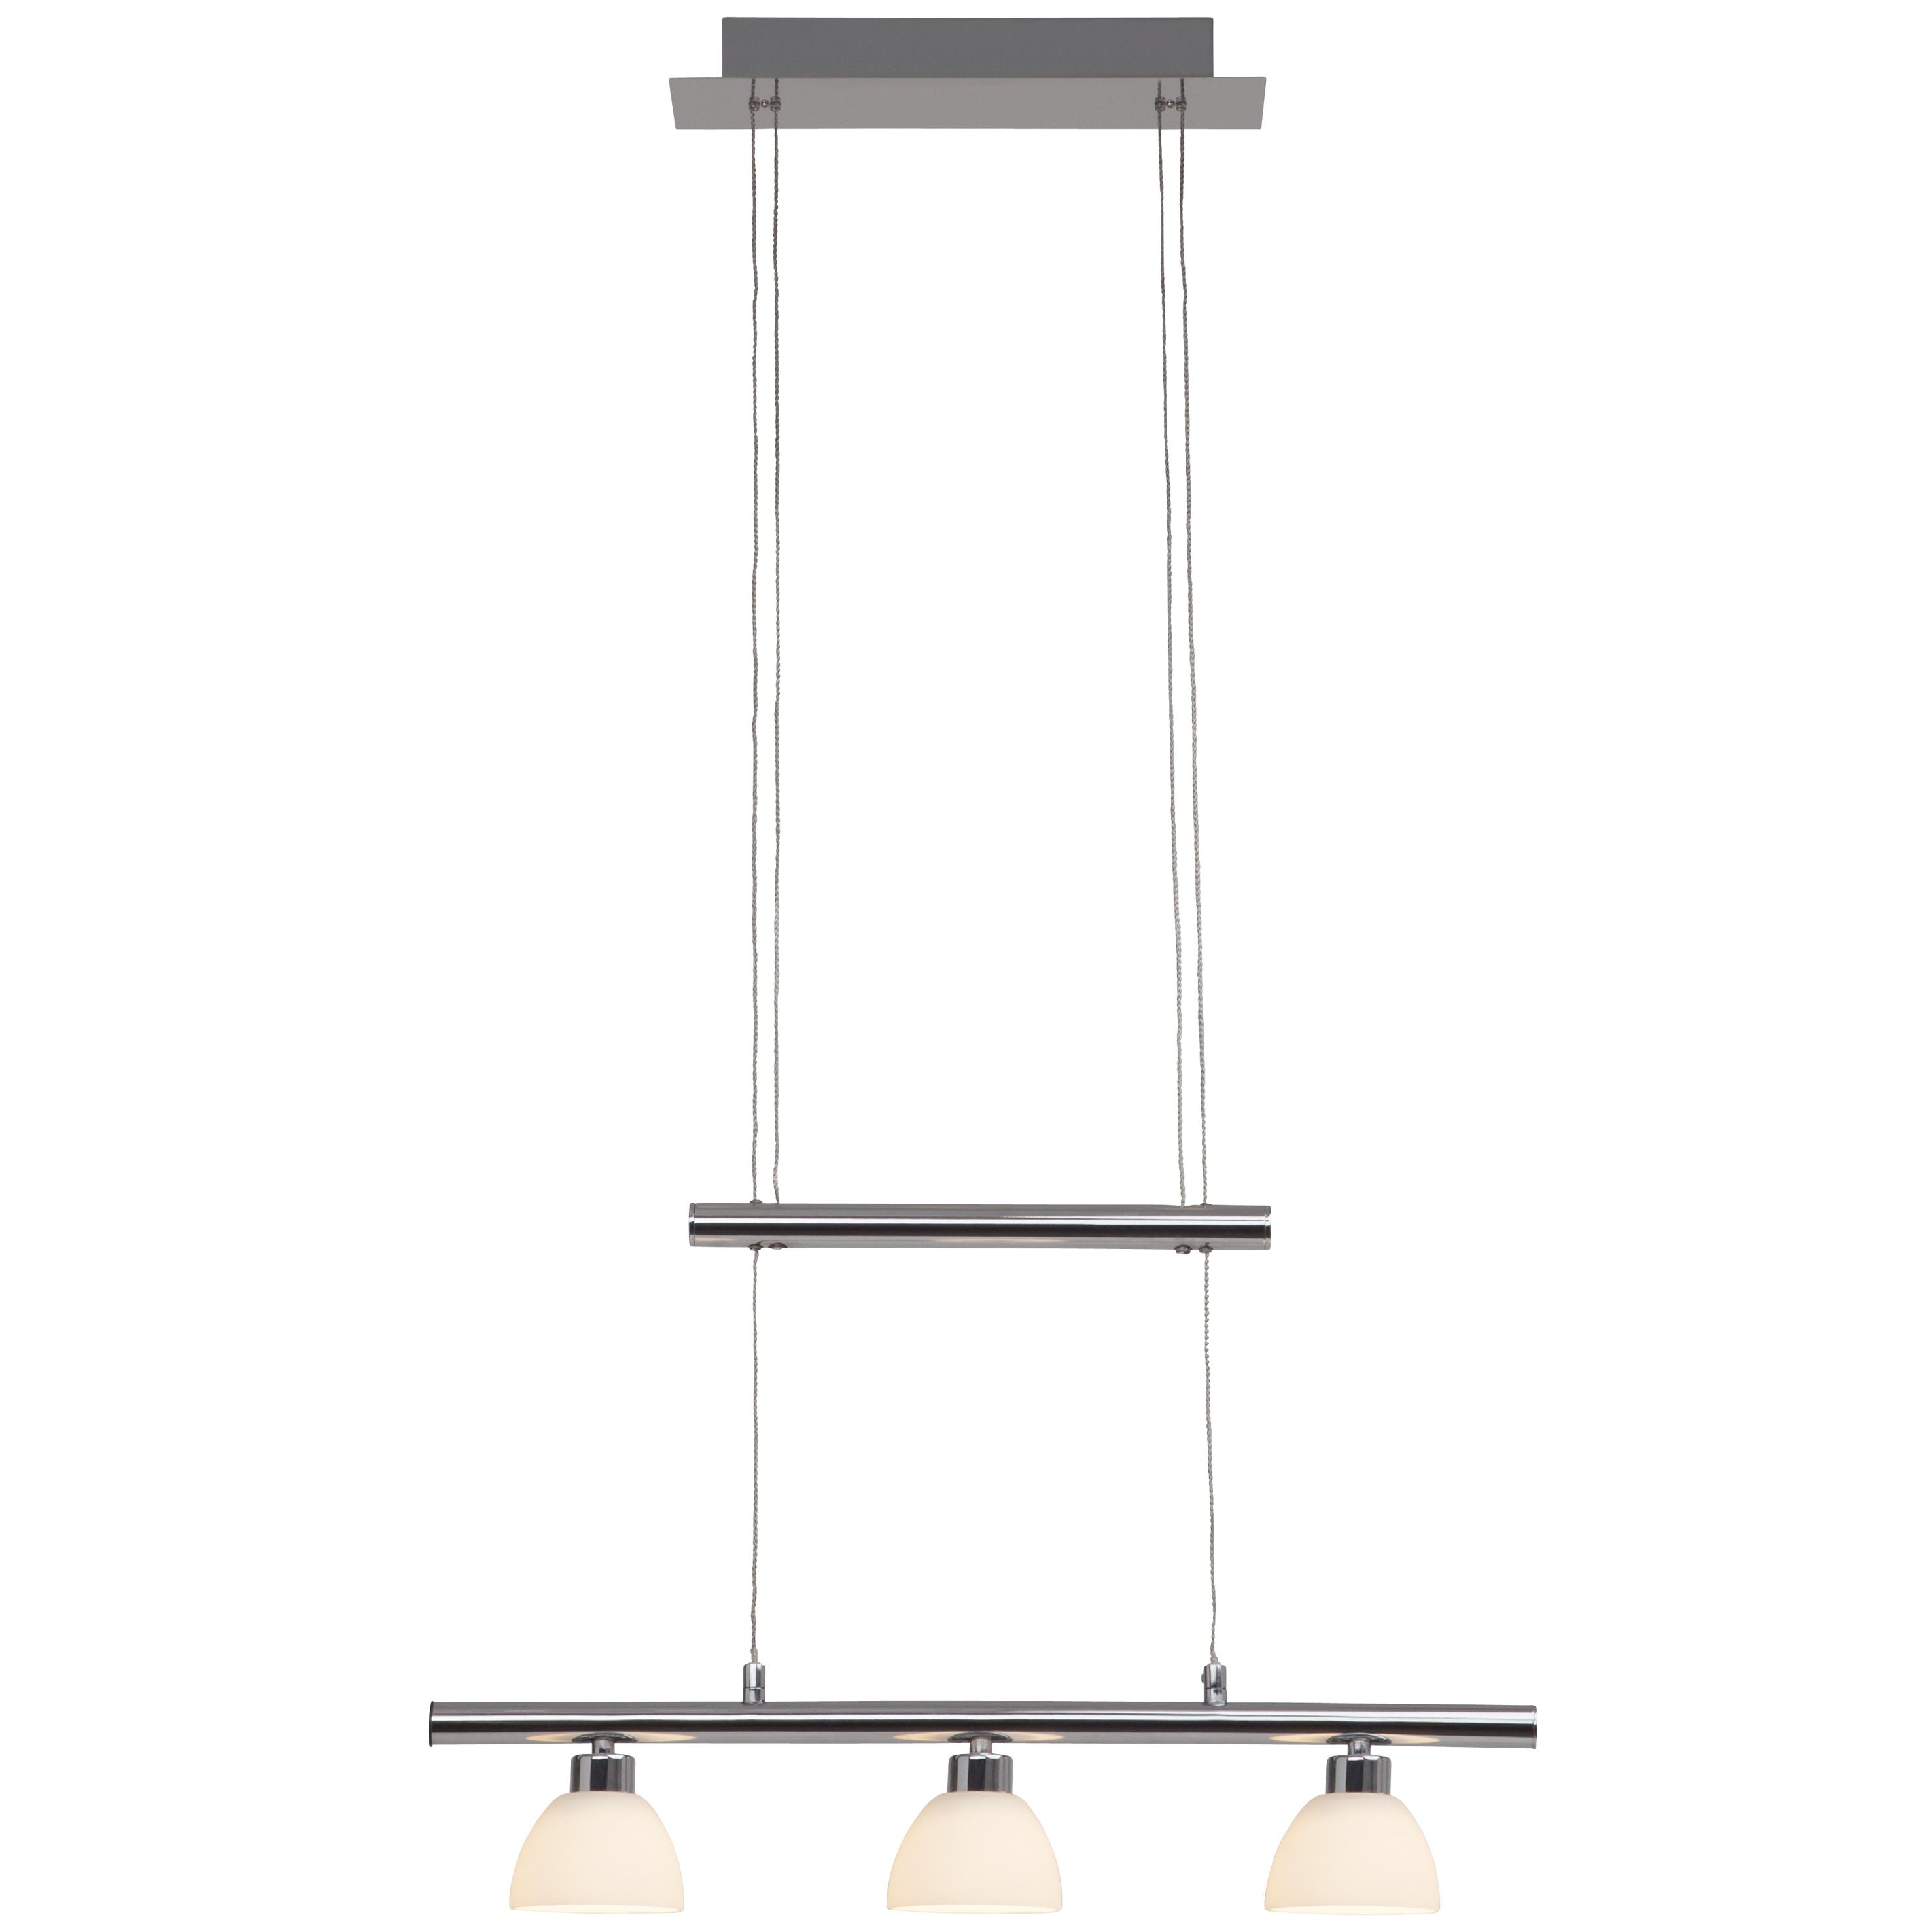 Brilliant Leuchten Tonja LED Pendelleuchte 3flg chrom/weiß